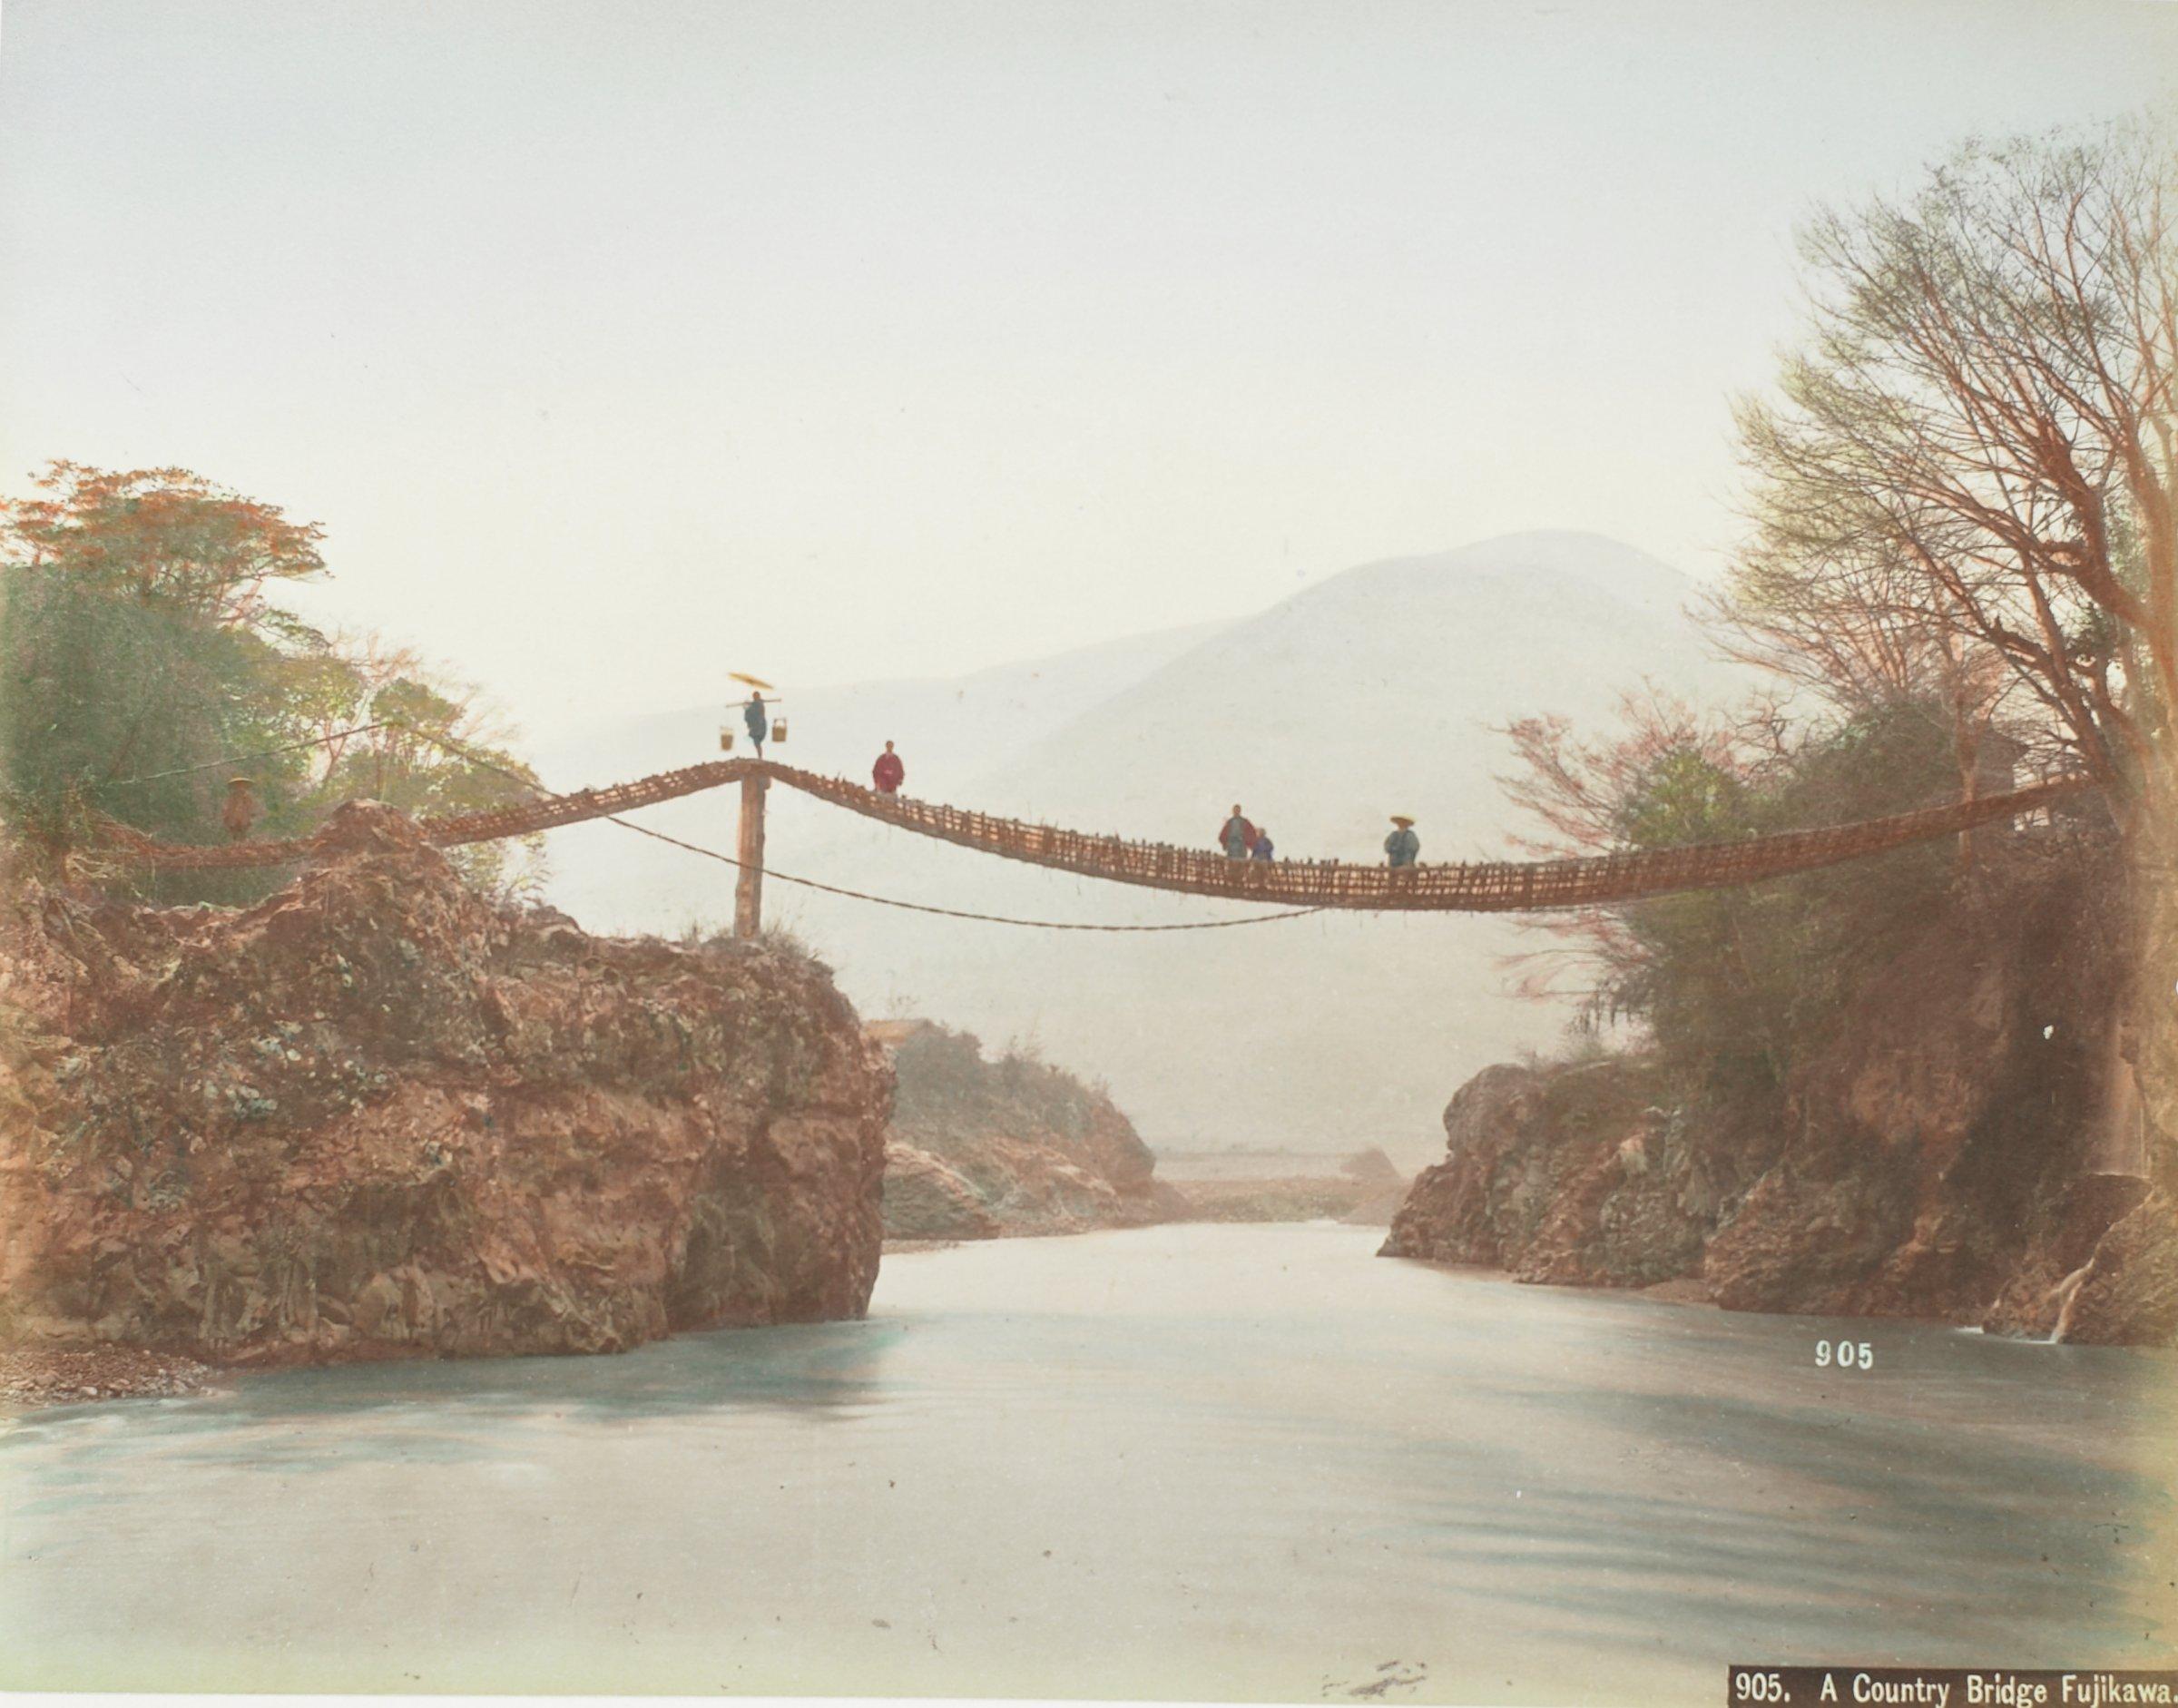 A Country Bridge Fujikawa (.34, recto); Stone Lanterns Shiba (.35, verso), Attributed to Kusakabe Kimbei, hand-colored albumen prints mounted to album page